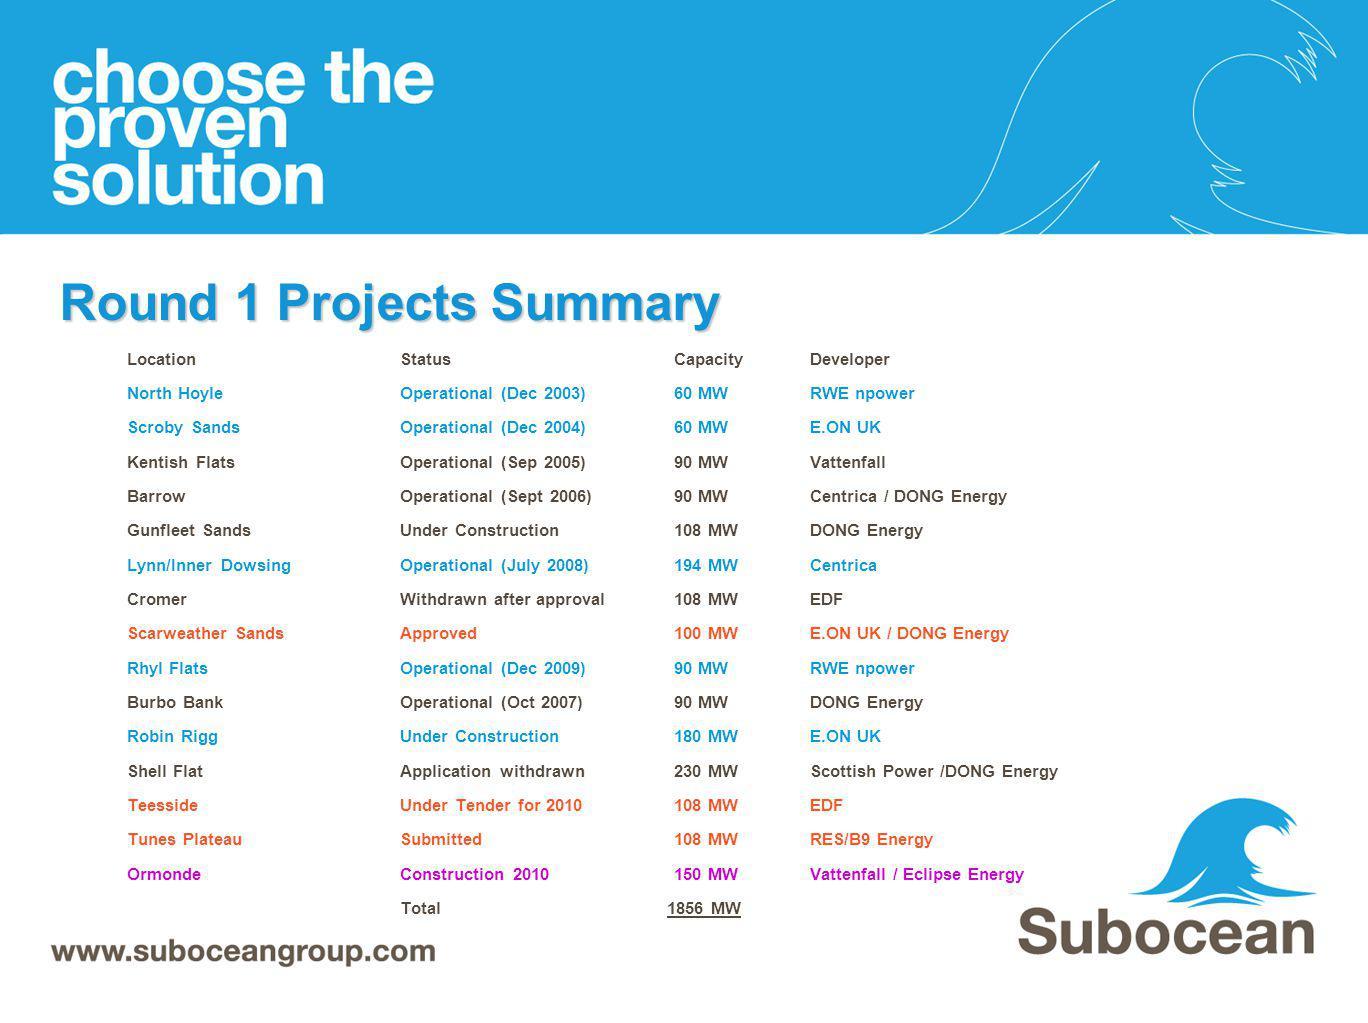 Round 1 Projects Summary LocationStatusCapacityDeveloper North HoyleOperational (Dec 2003)60 MWRWE npower Scroby SandsOperational (Dec 2004)60 MWE.ON